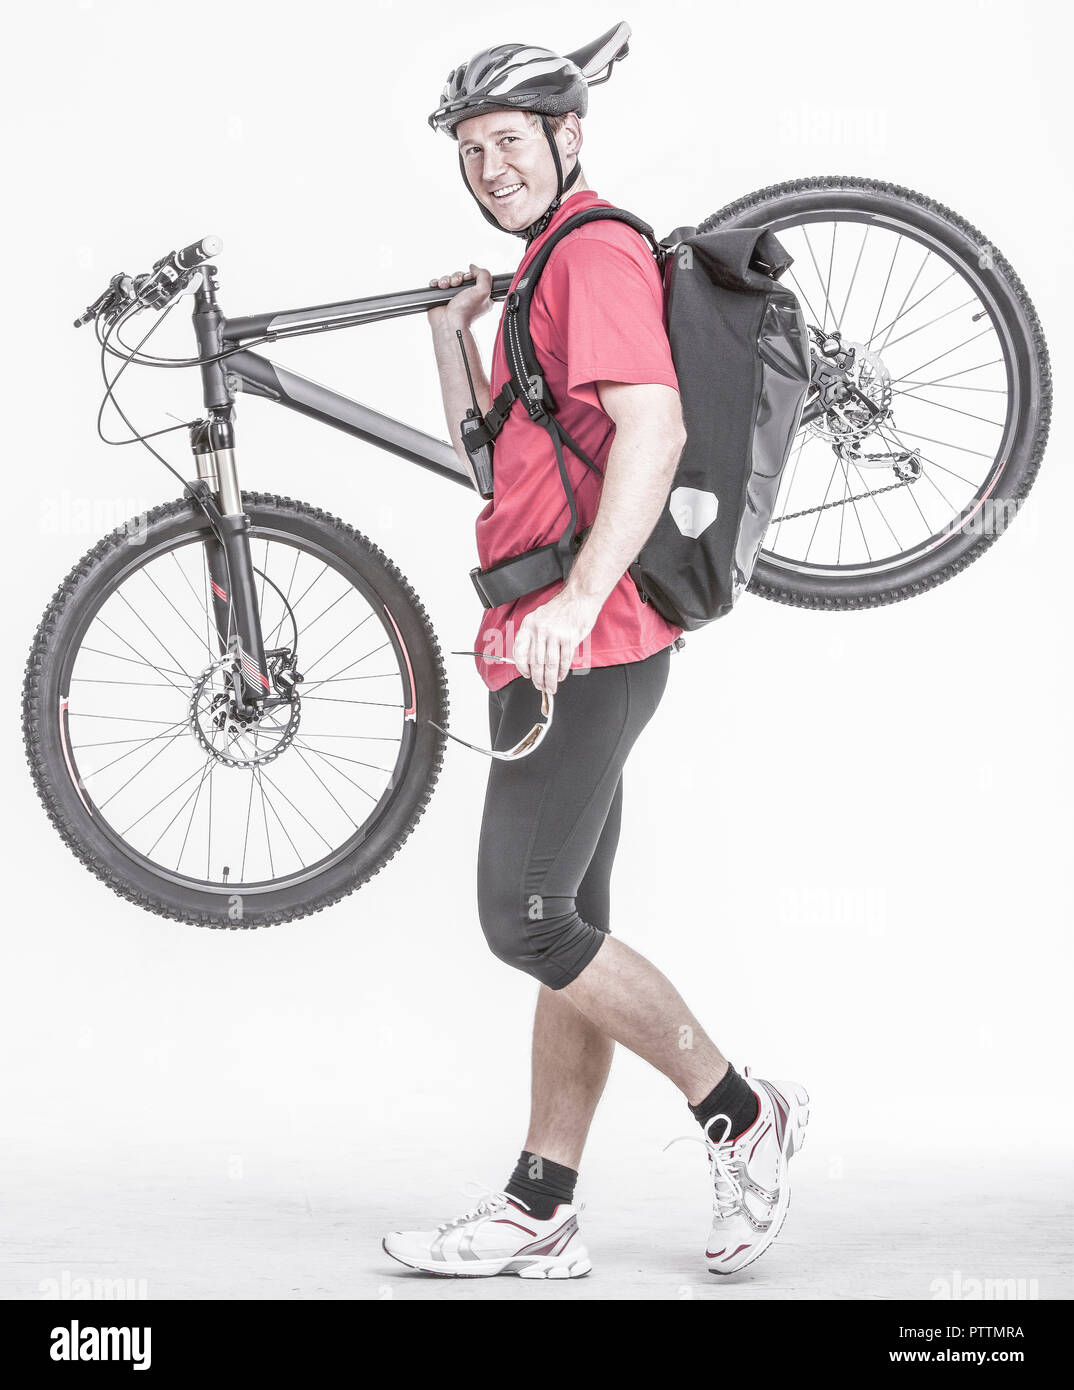 Fahrradkurier traegt sein Rennrad (model-released) Stock Photo